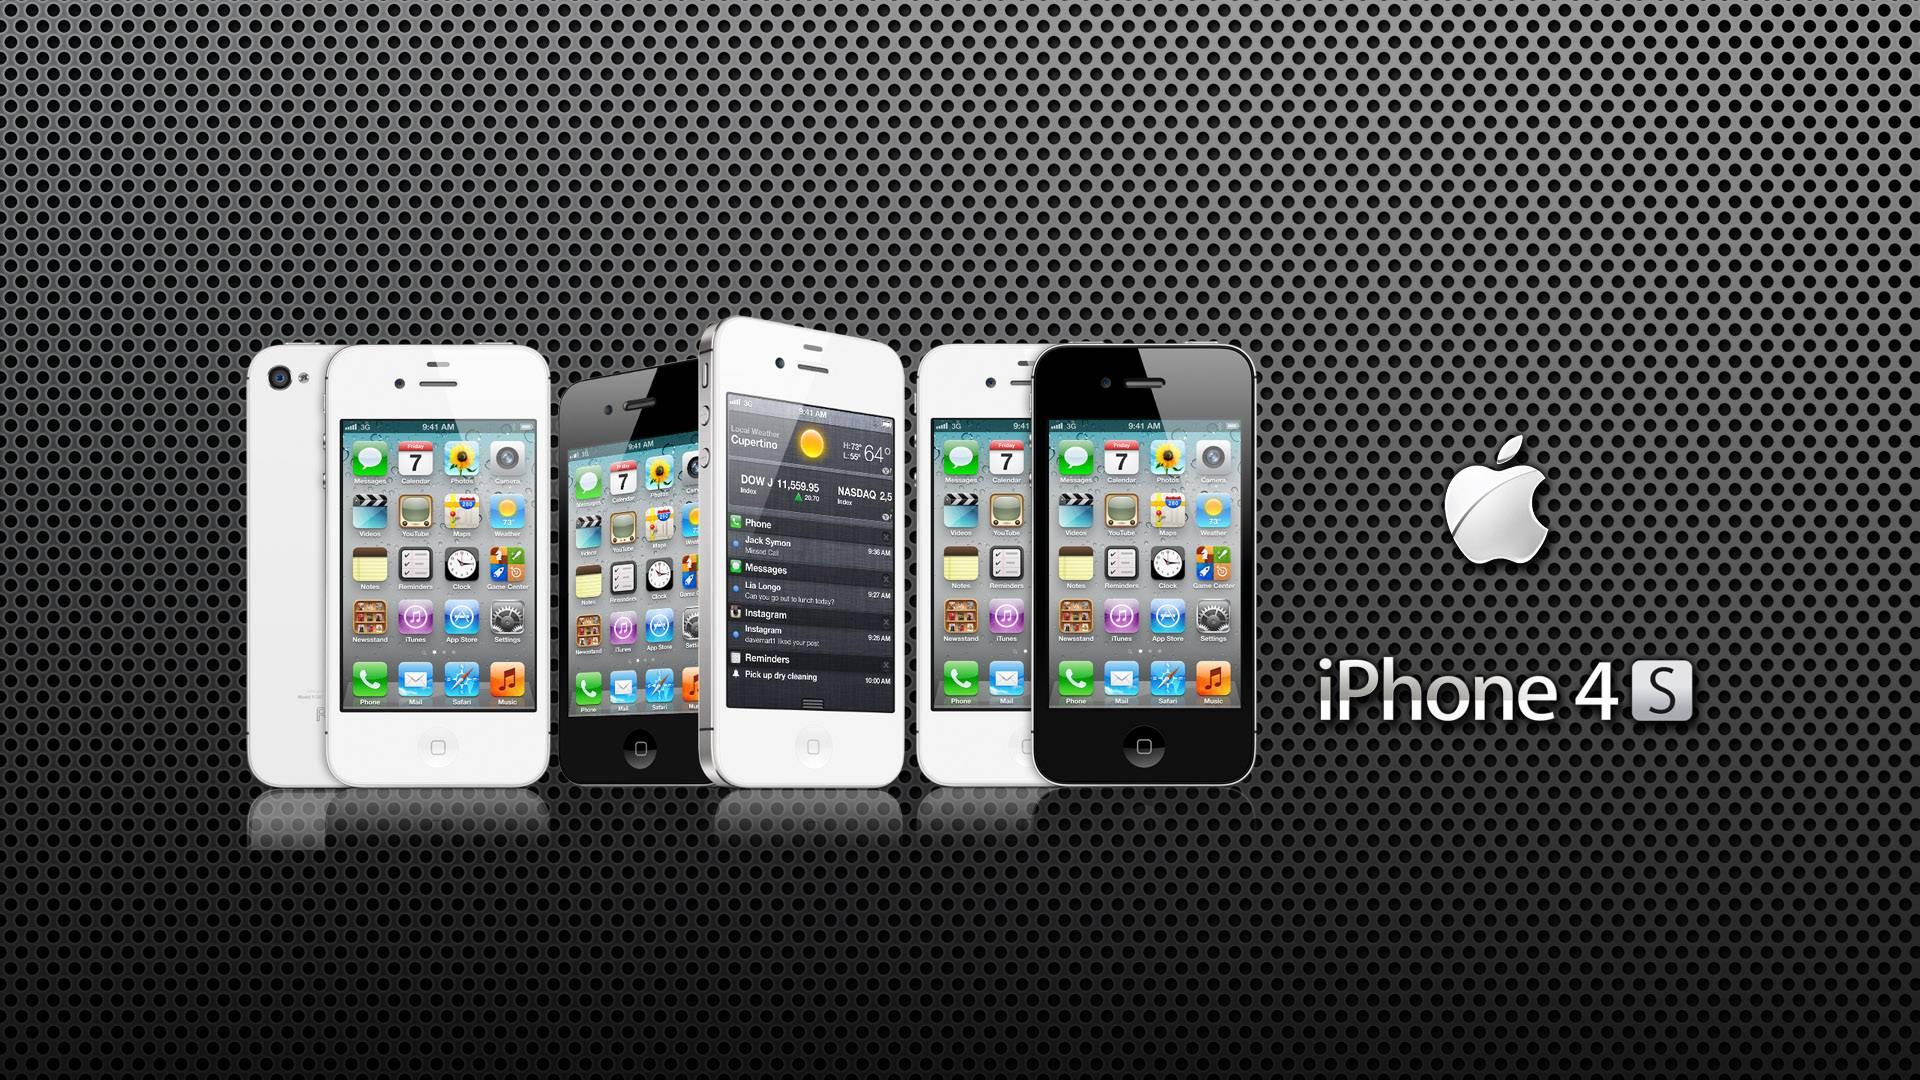 20954 apple apple iphonejpg 1920x1080